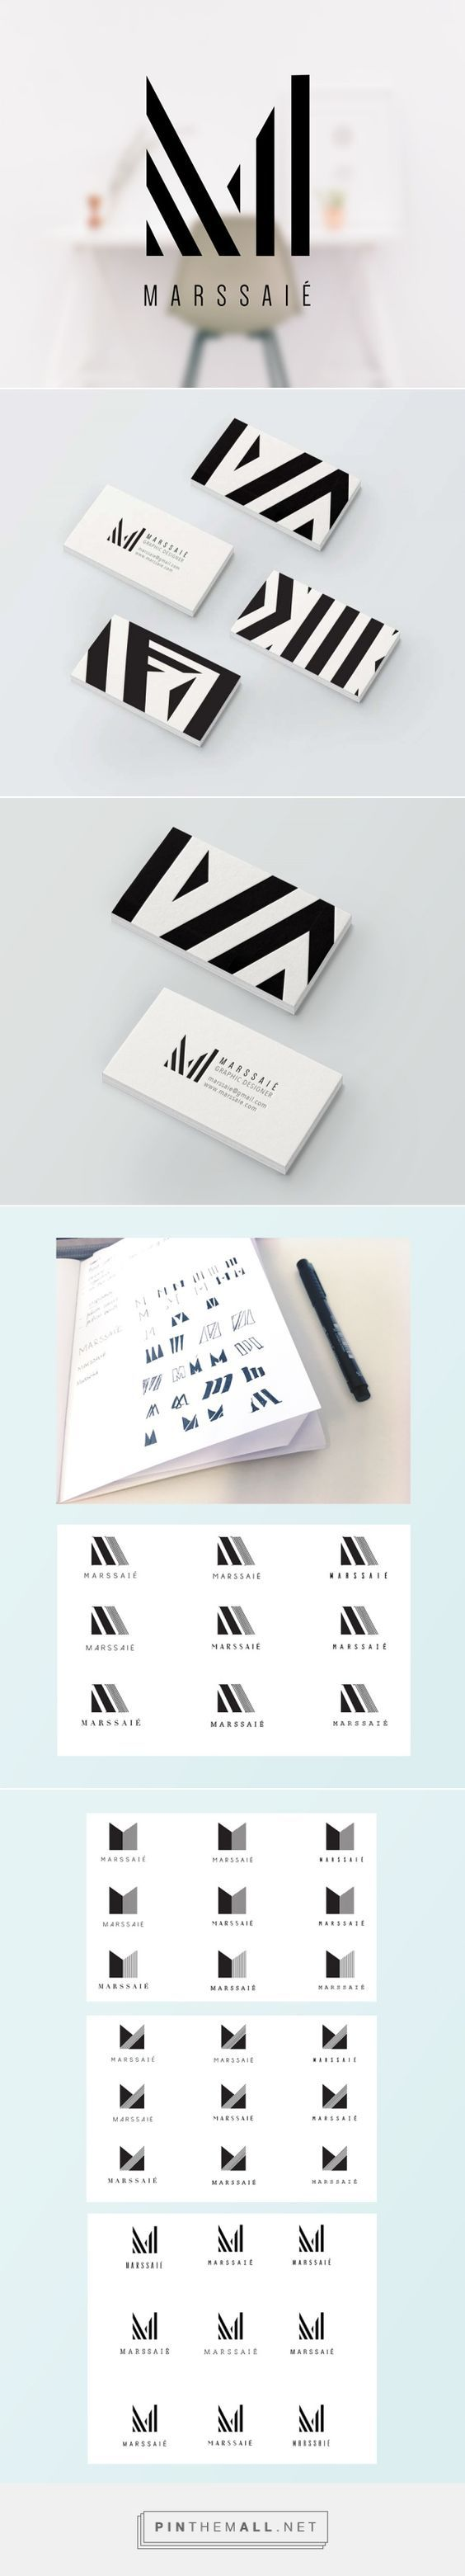 #branding | Marssaié - personal identity  Graphic designer visual identity…